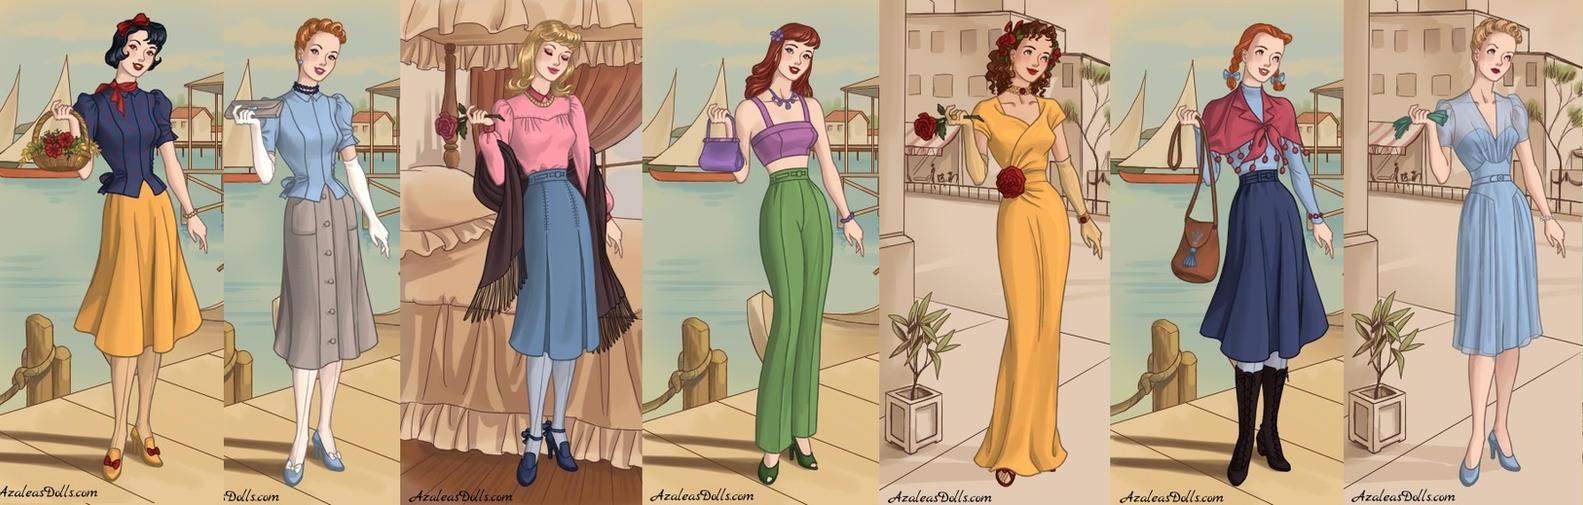 disney princesses 1940s fashion part1 by adrianaTheGirlOnFire